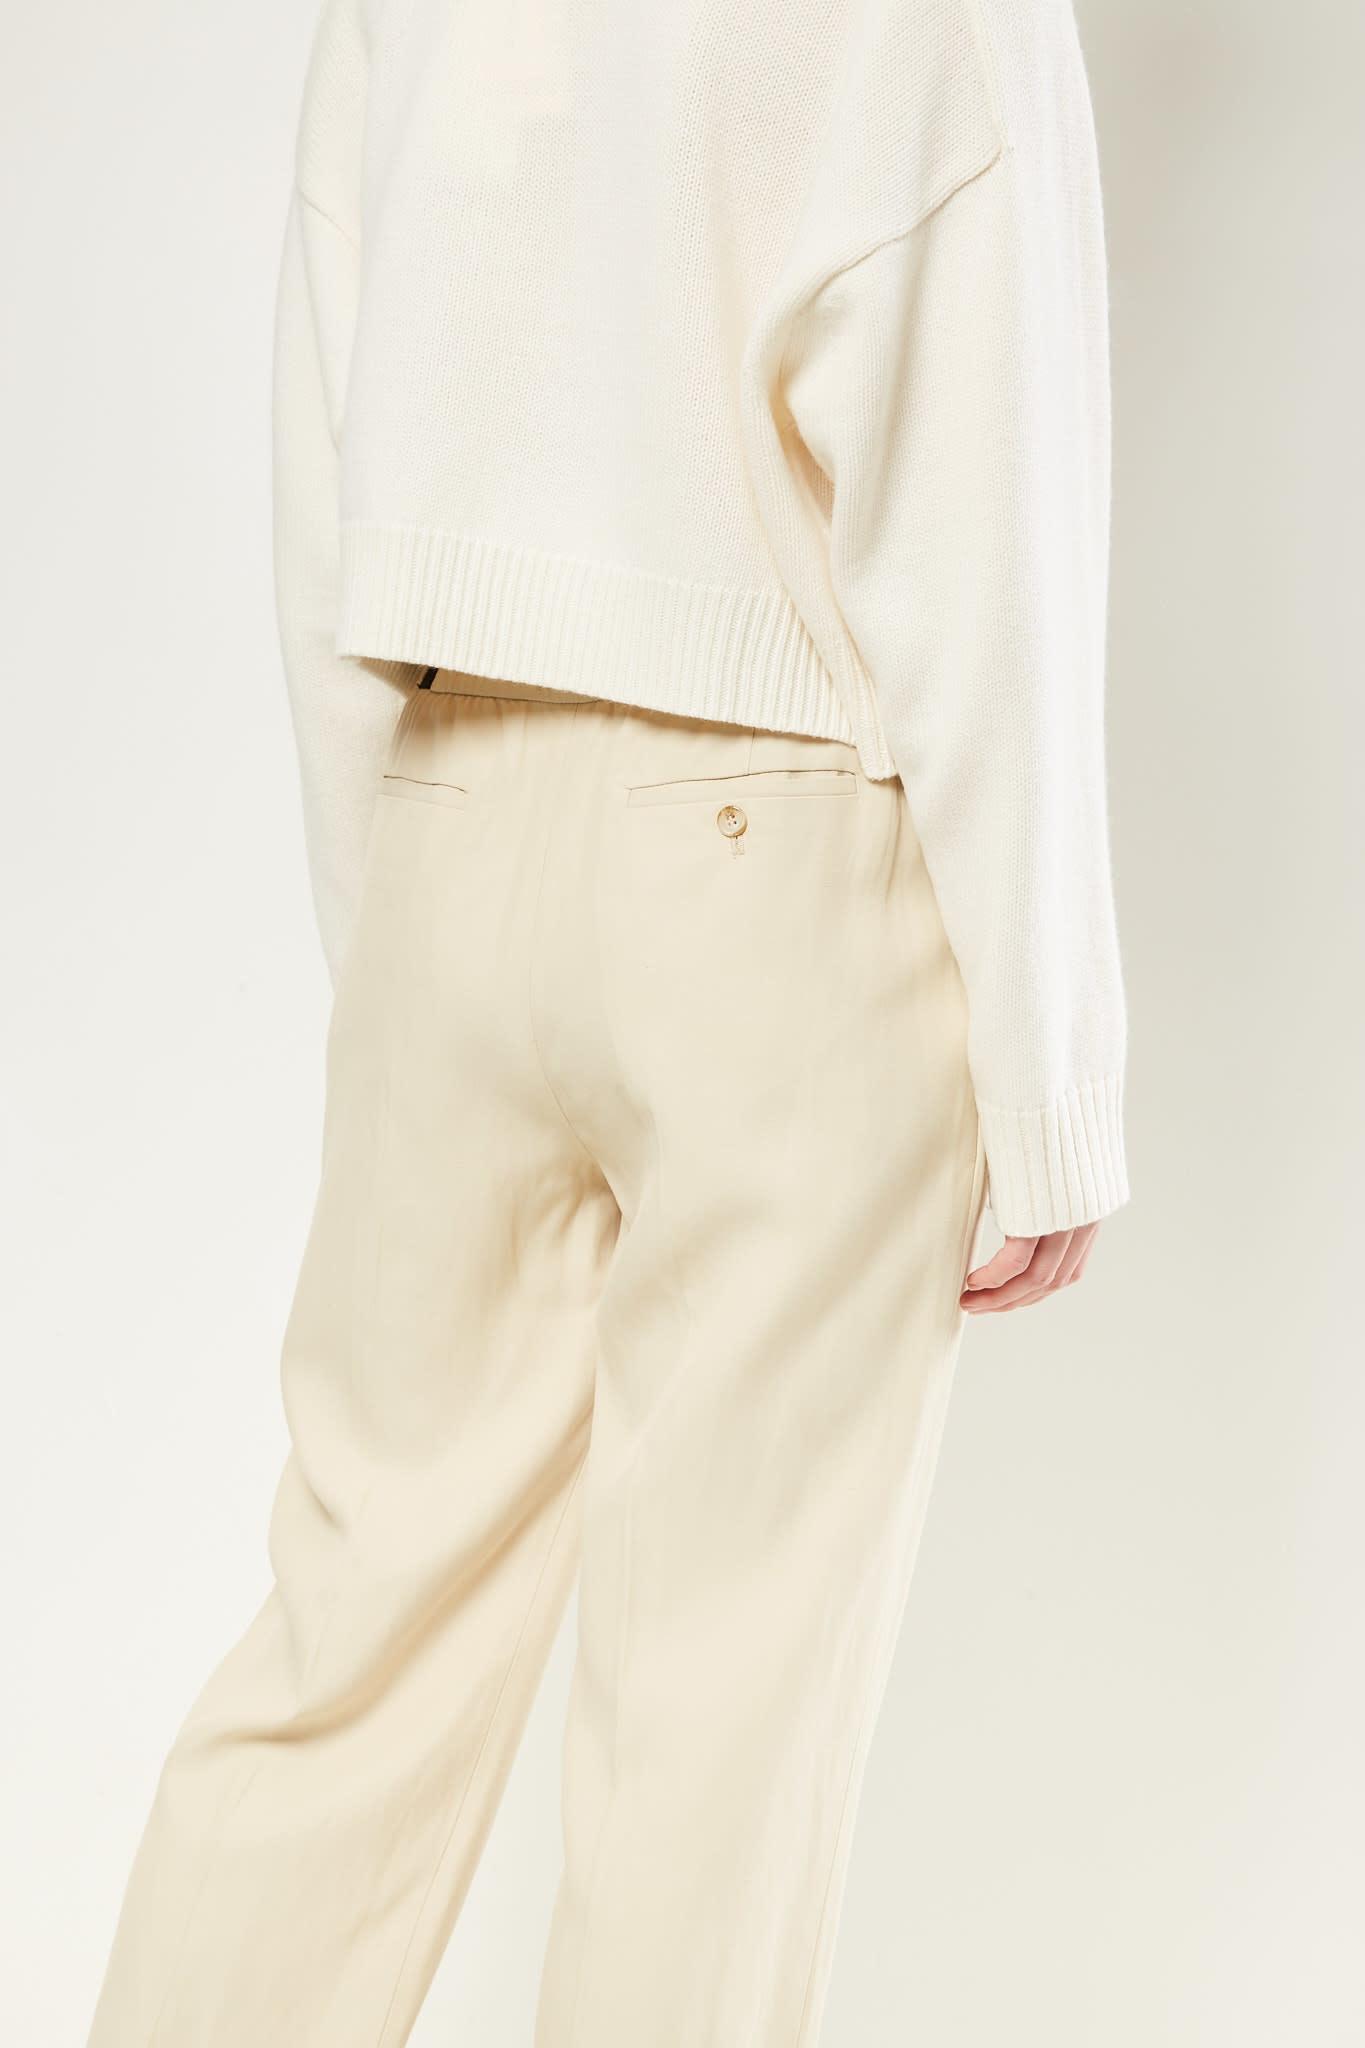 loulou studio - Takaroa elastic pants